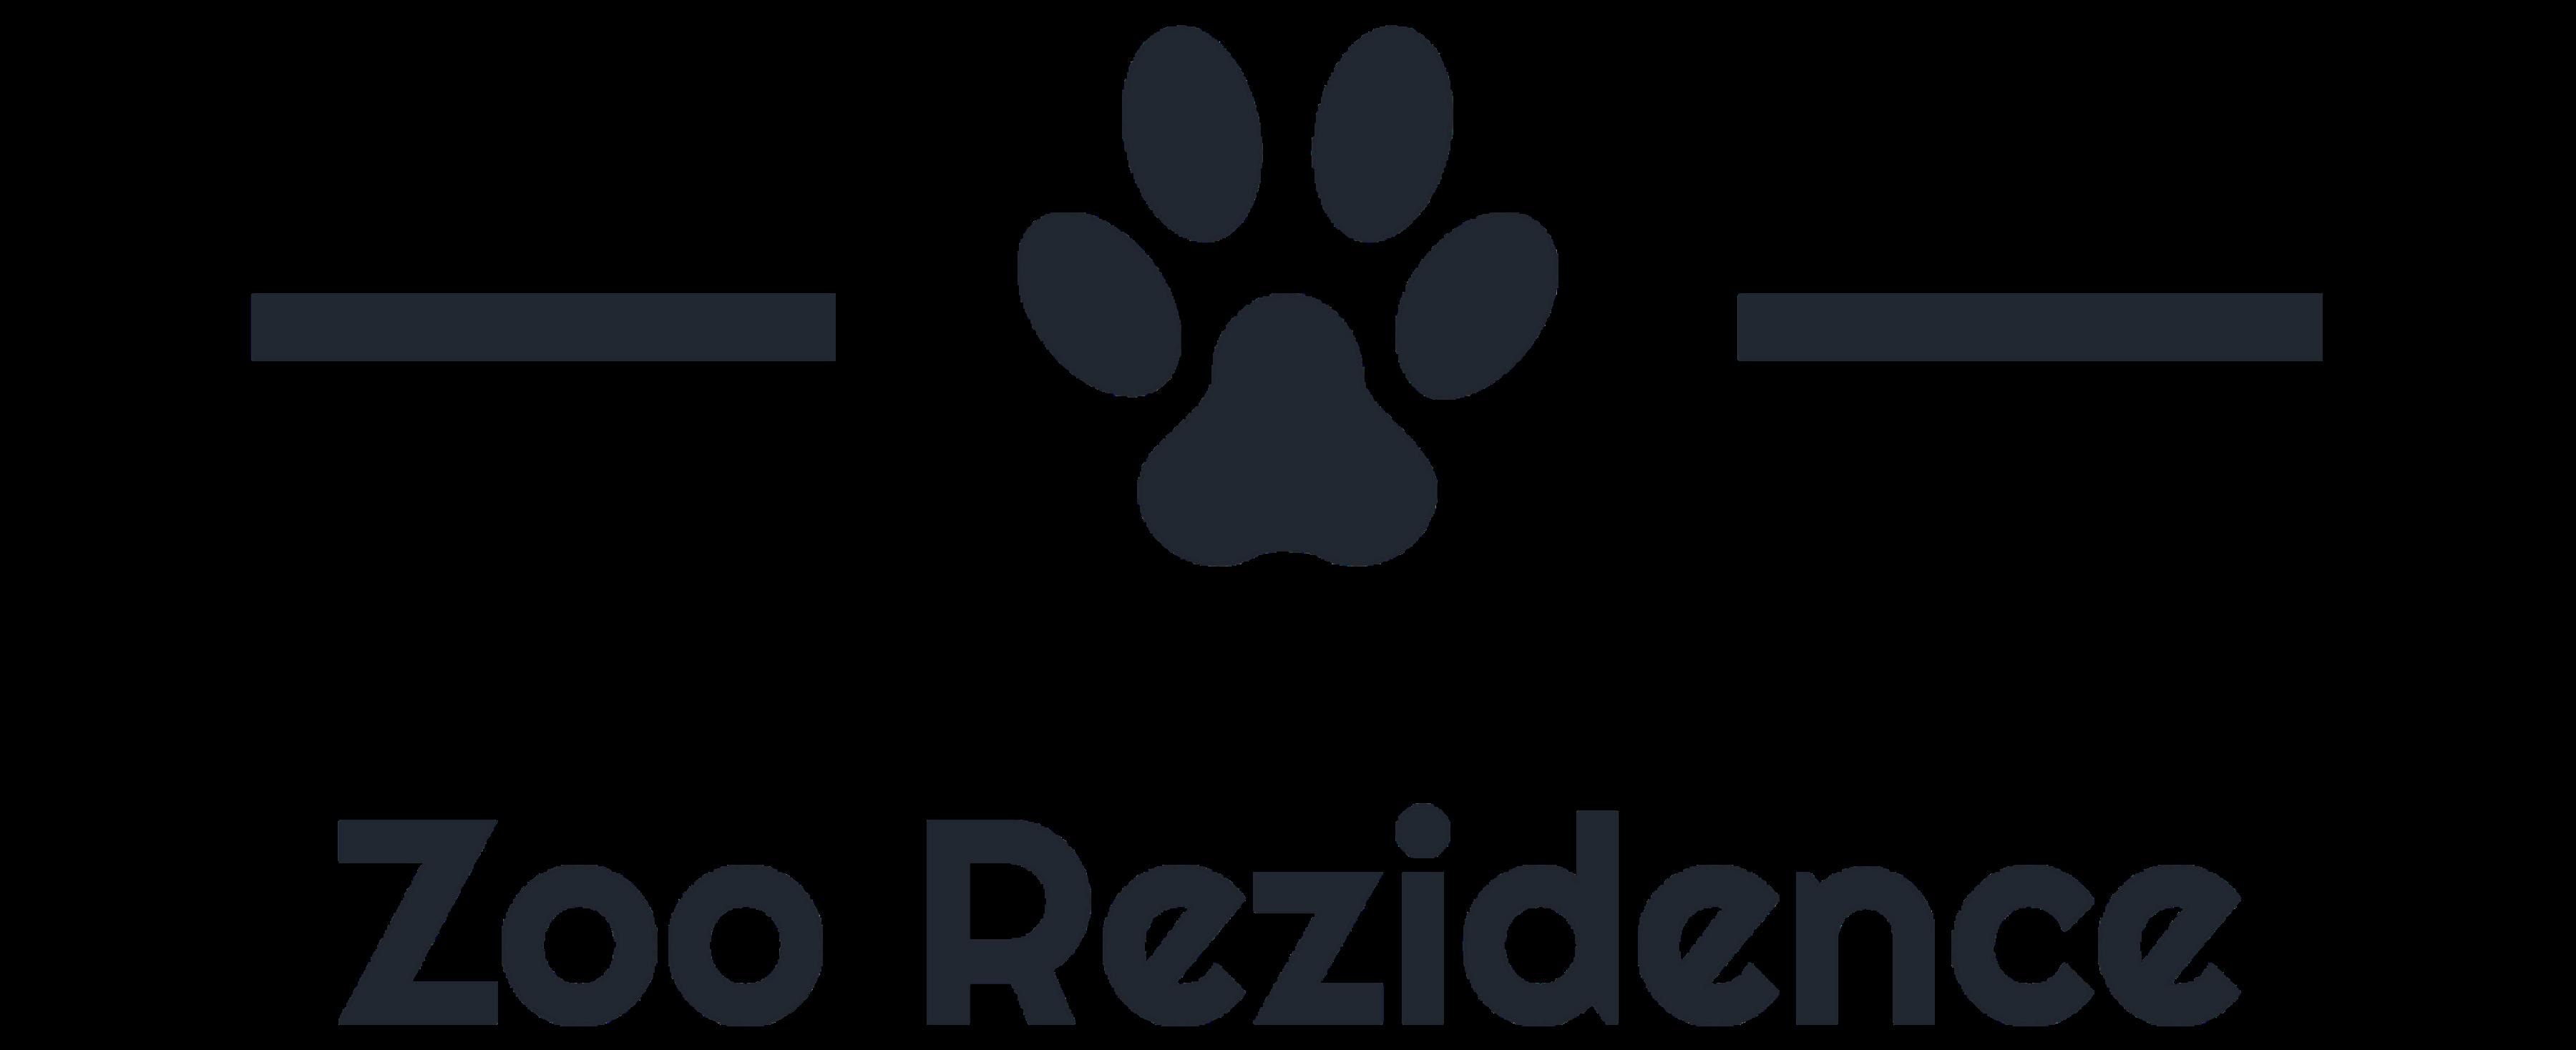 Zoo Rezidence